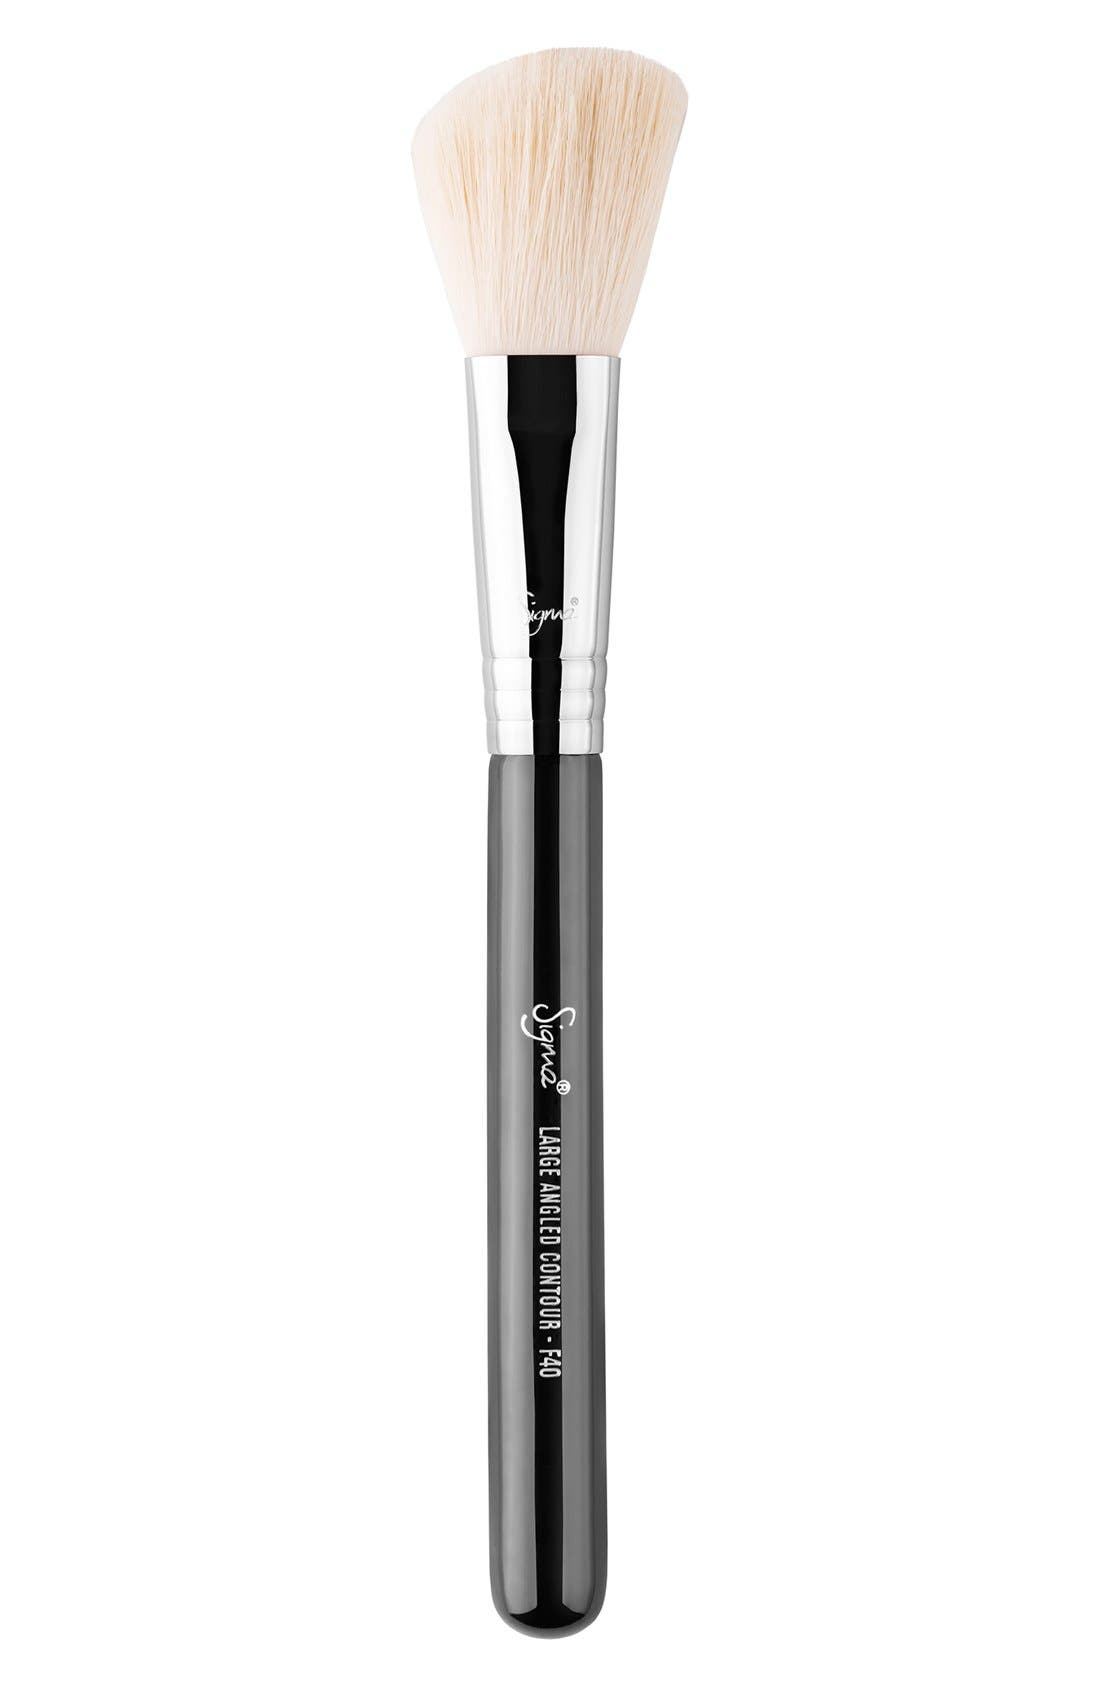 F40 Large Angled Contour Brush,                             Main thumbnail 1, color,                             NO COLOR